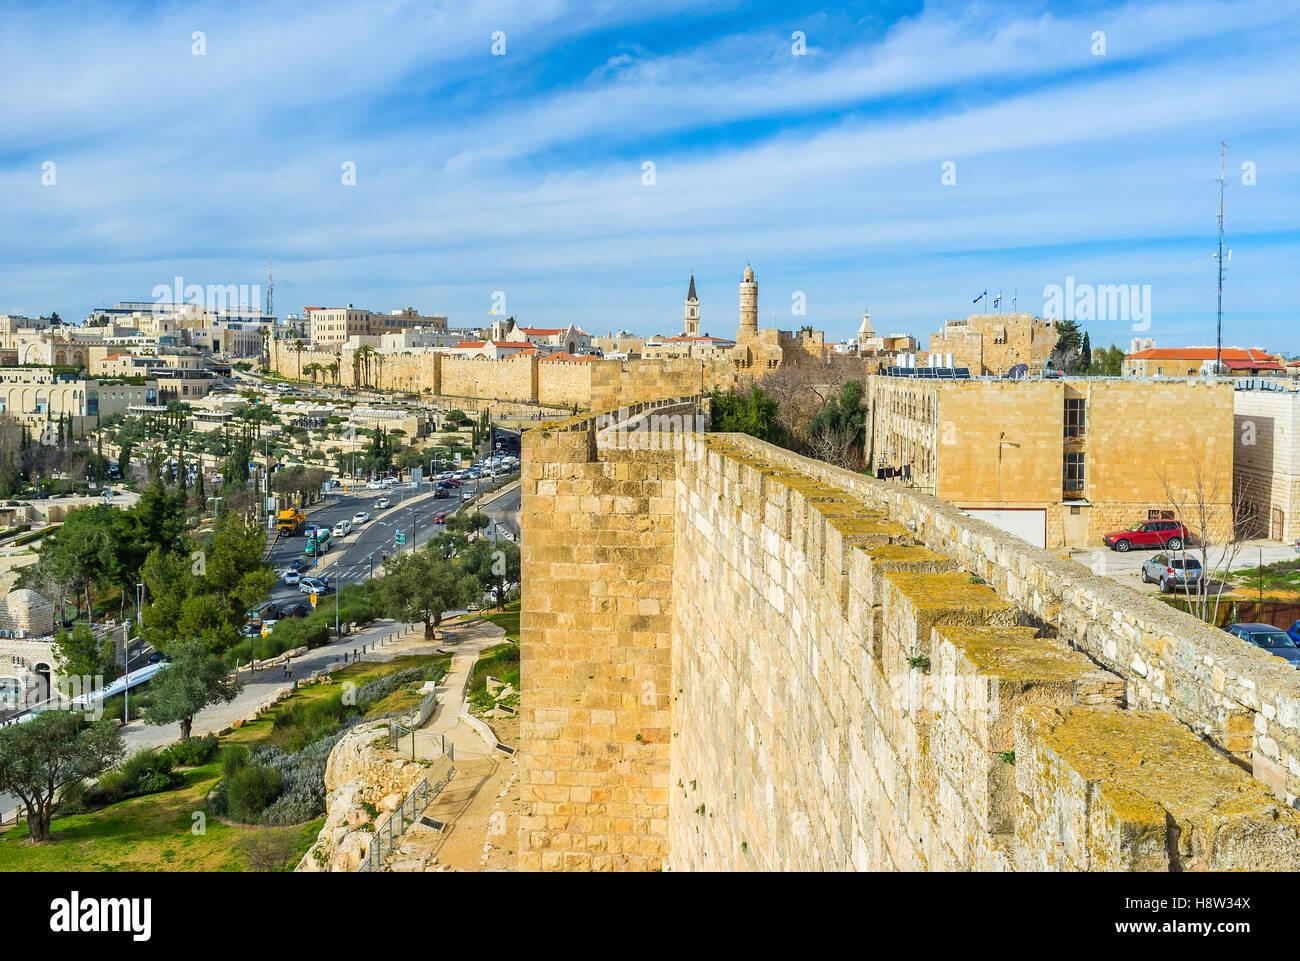 Israel Palestine Stock Photos & Israel Palestine Stock Images - Alamy